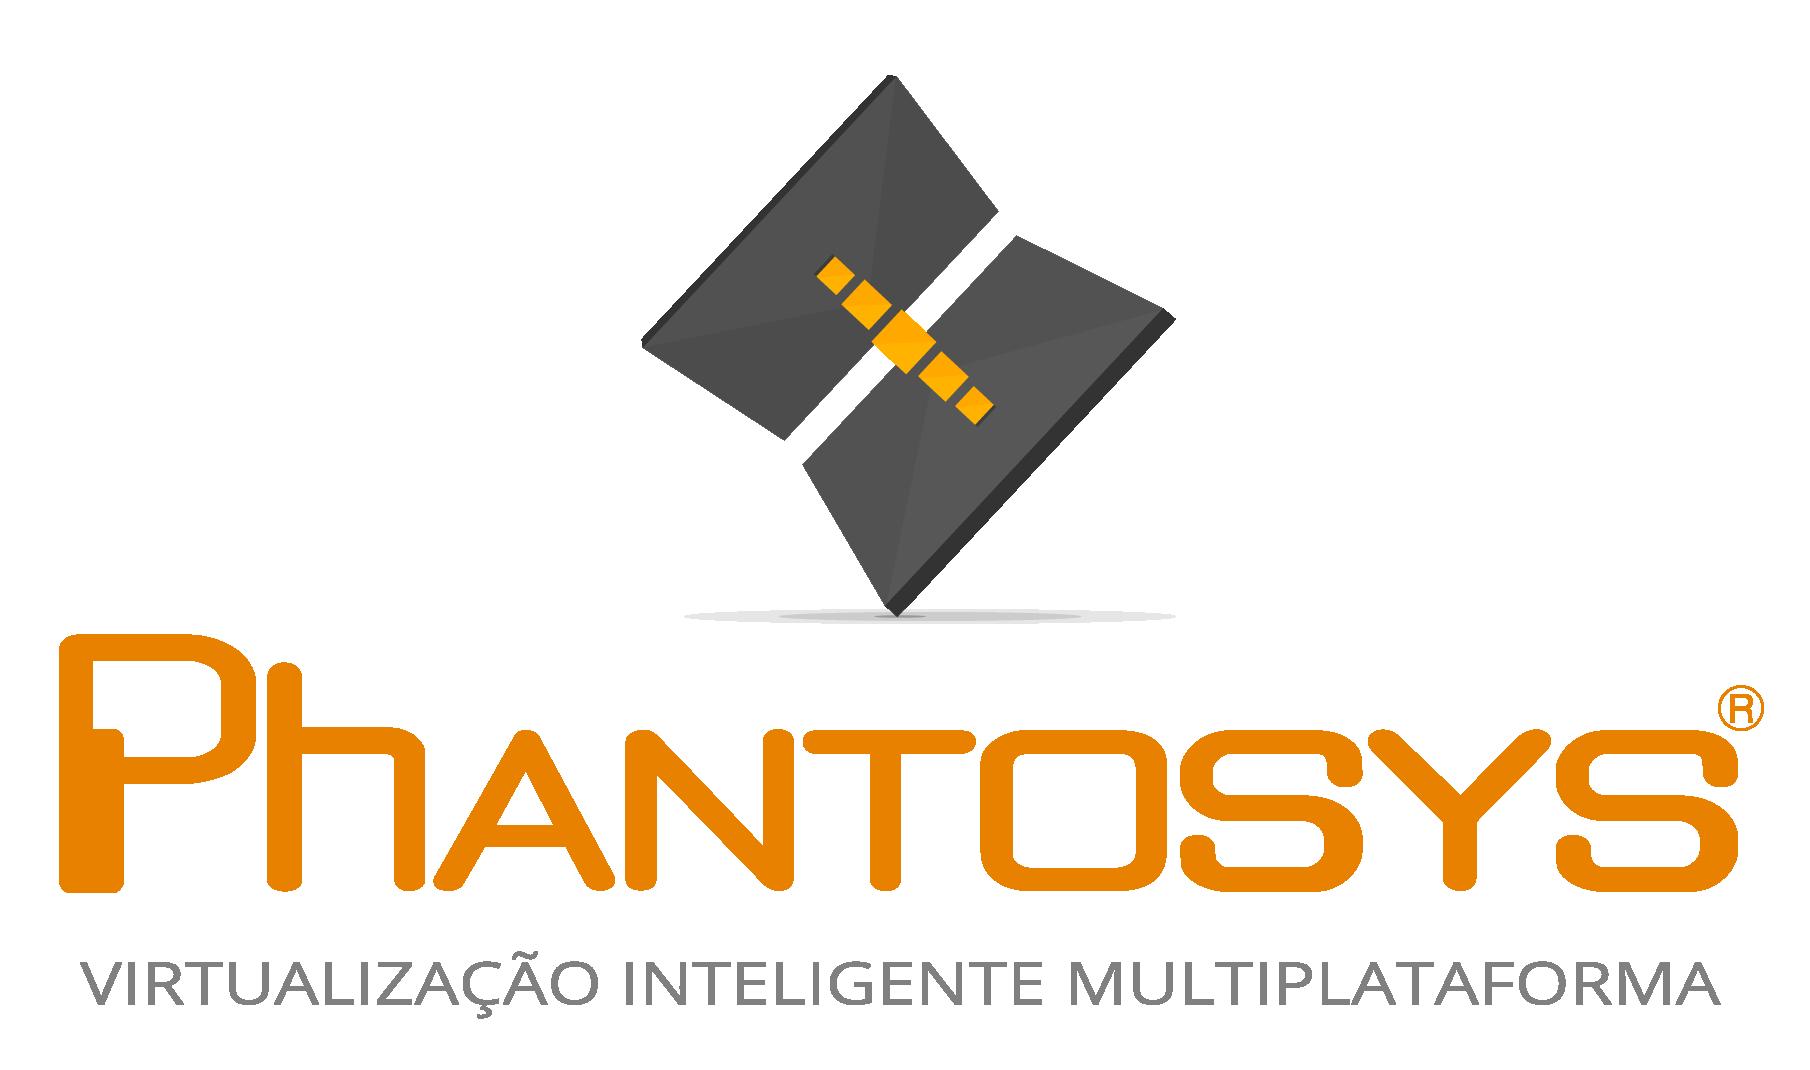 Phantosys - Virtualizacao Inteligente Multiplataforma